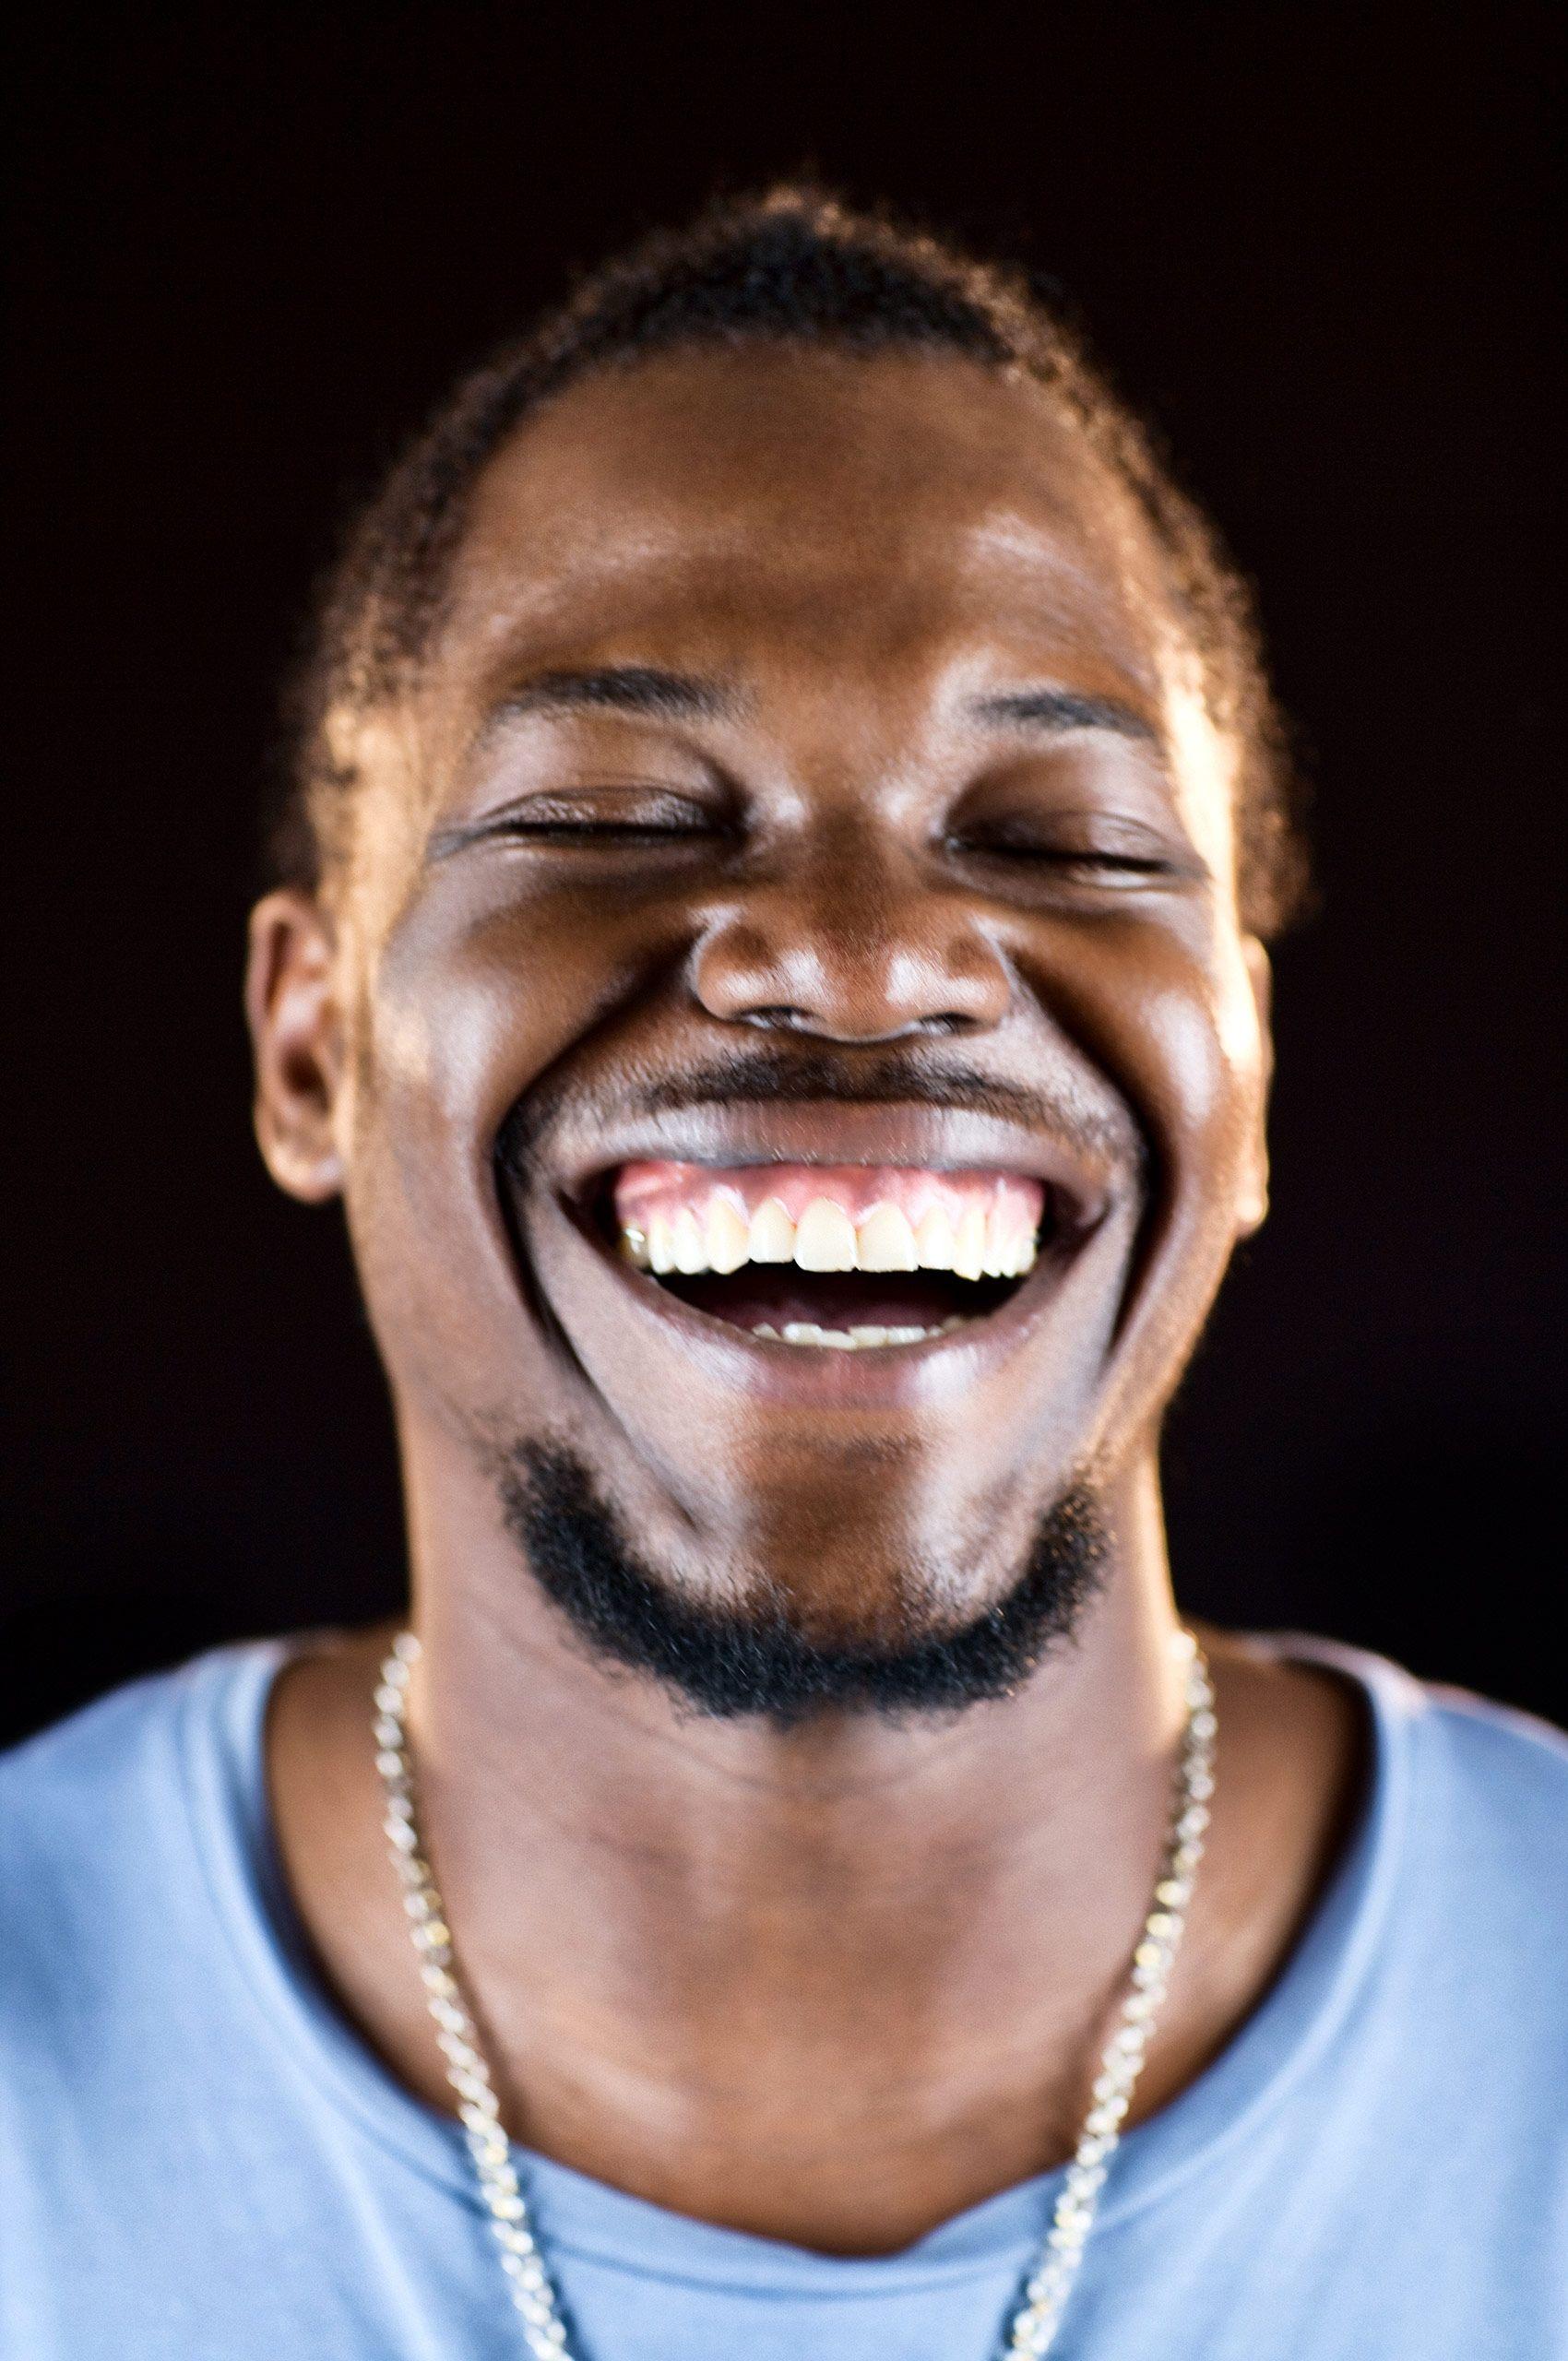 Africanamerican-man-laughing-HenrikOlundPhotography.jpg